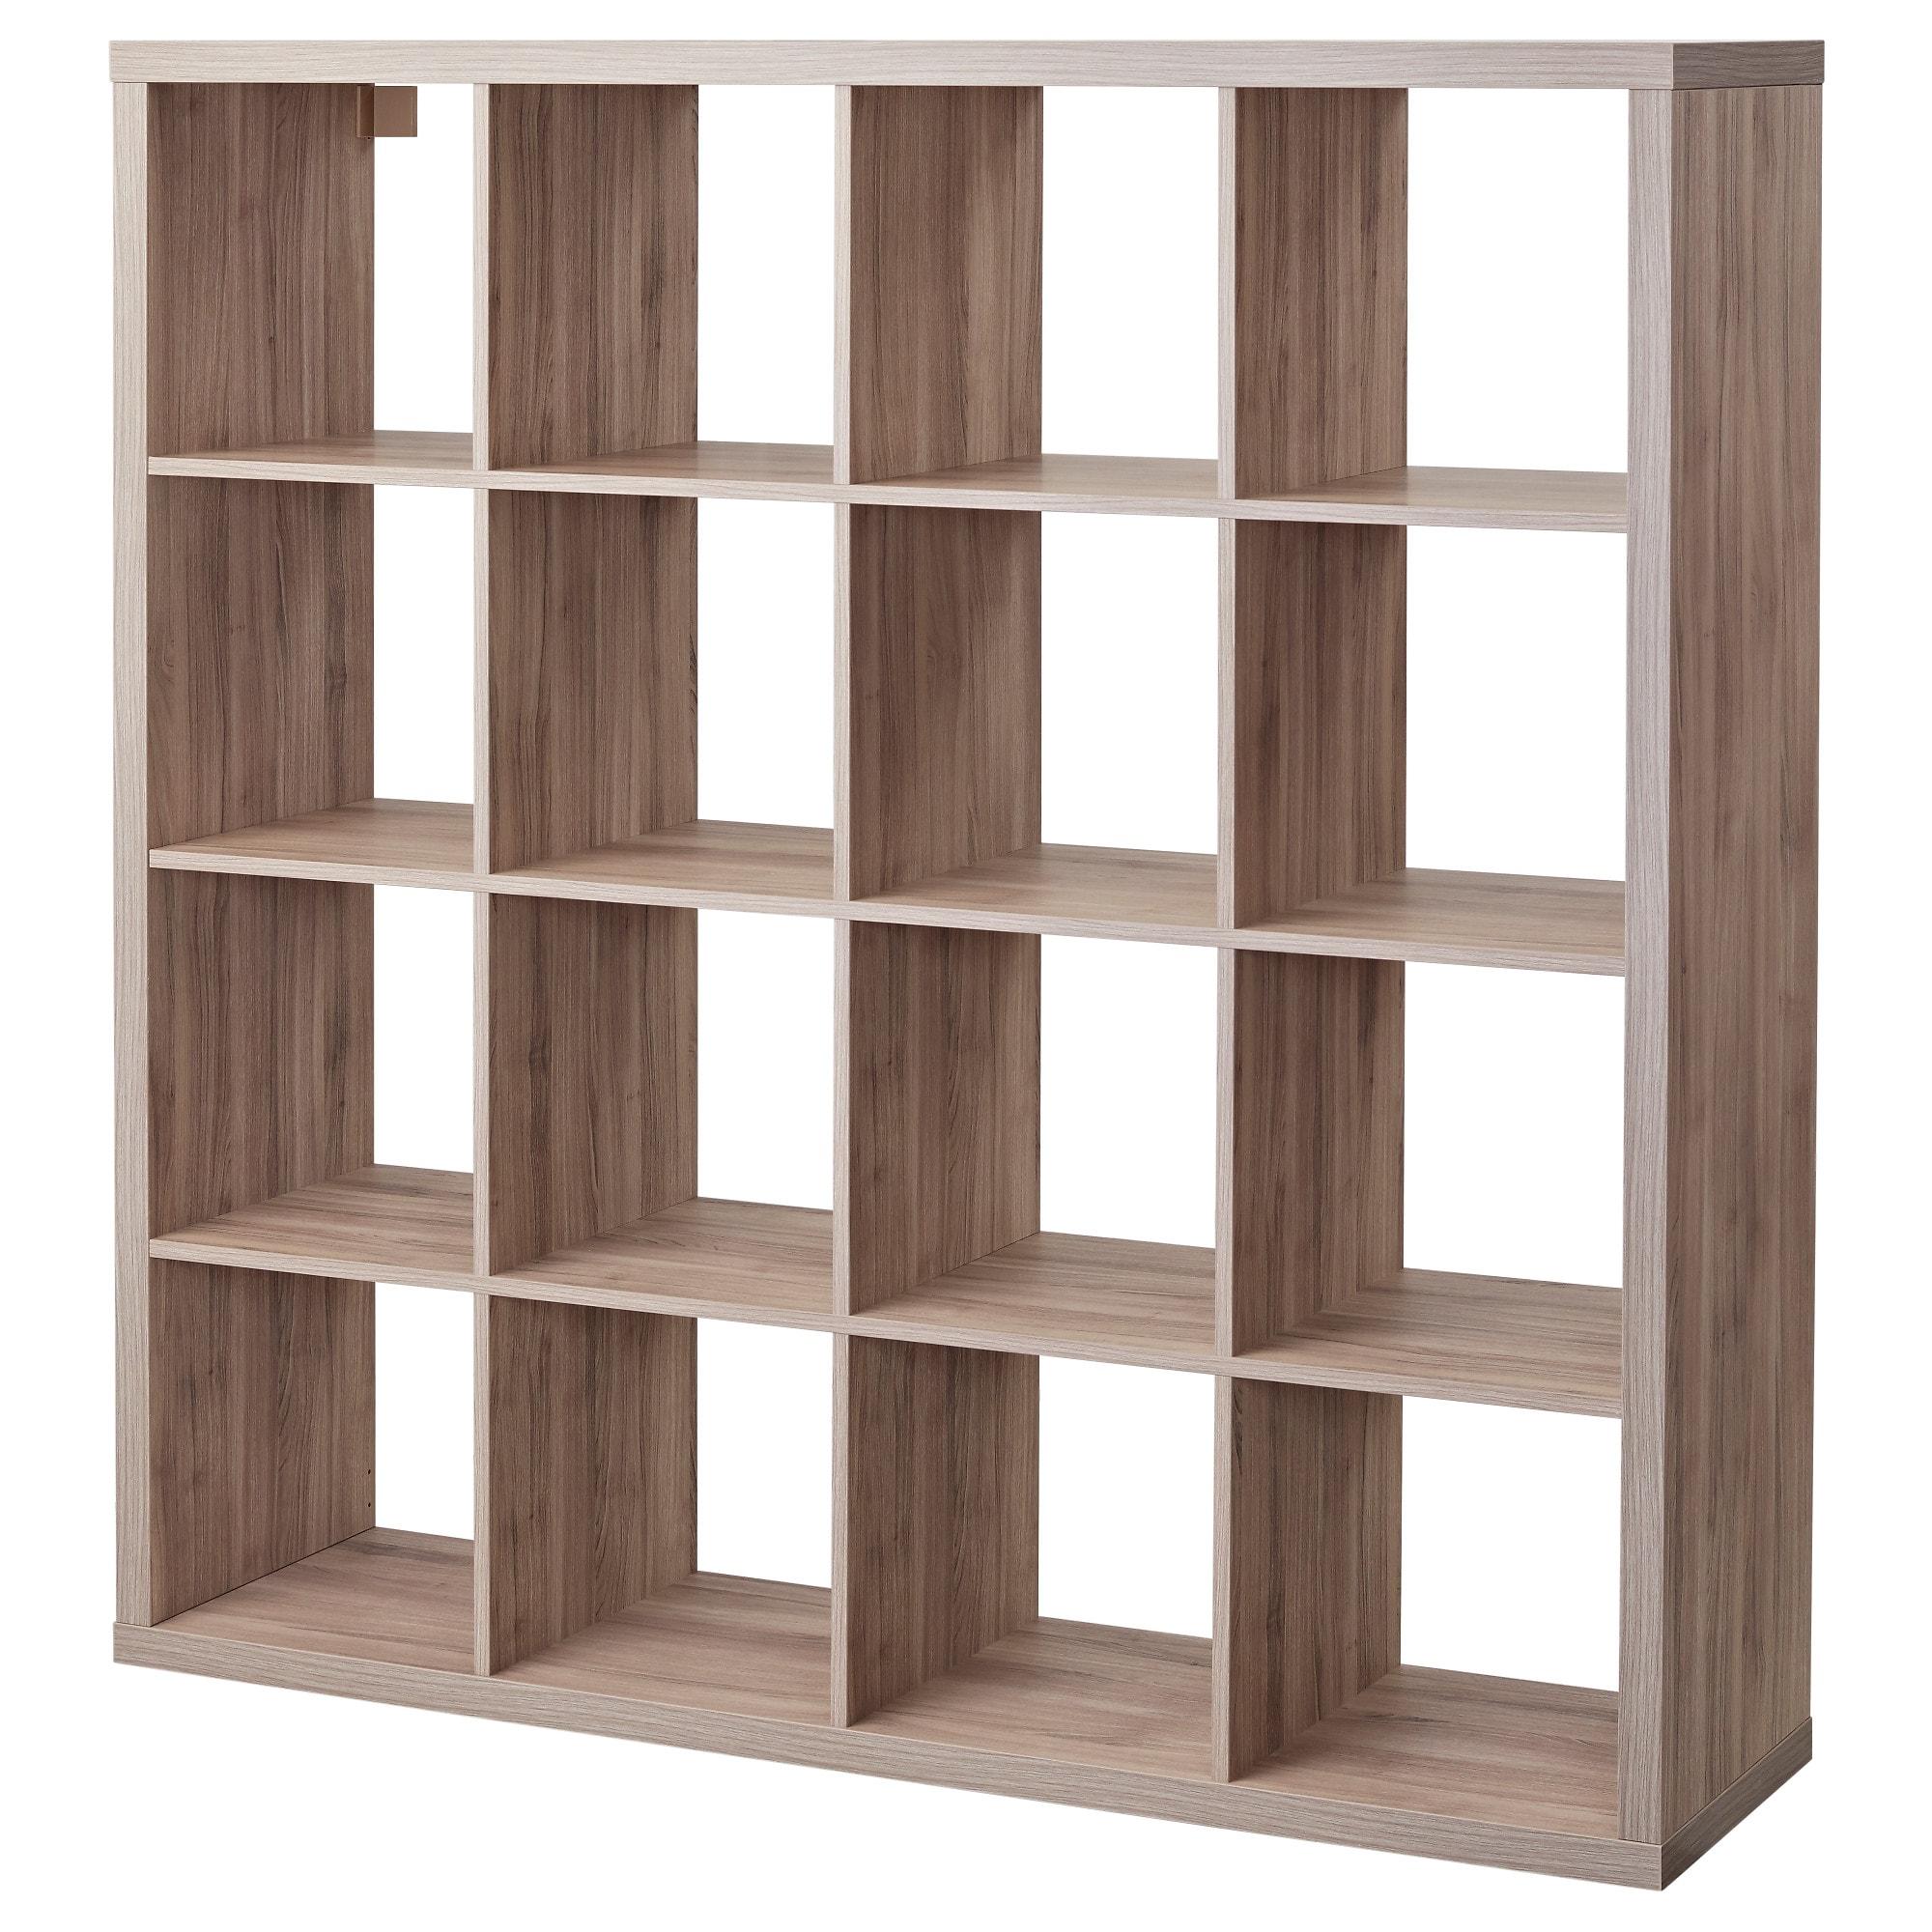 kallax shelf unit black brown ikea target floating instructions garage storage units big wall bookshelf entry mirror with key hooks and innovative designs inch bathroom under